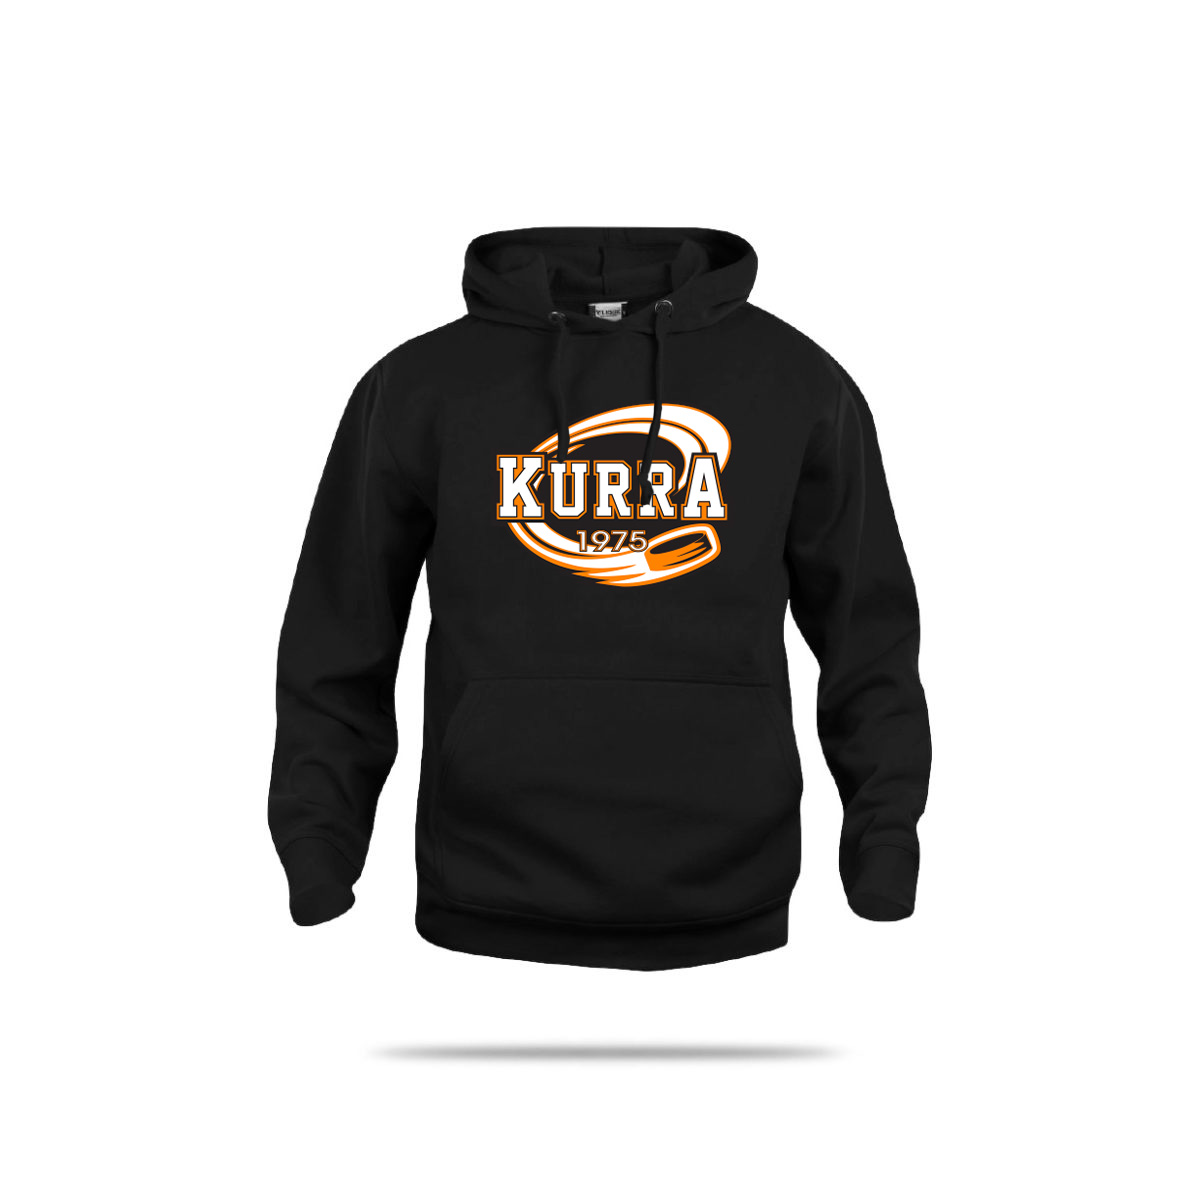 Kurra-Original-3022-musta